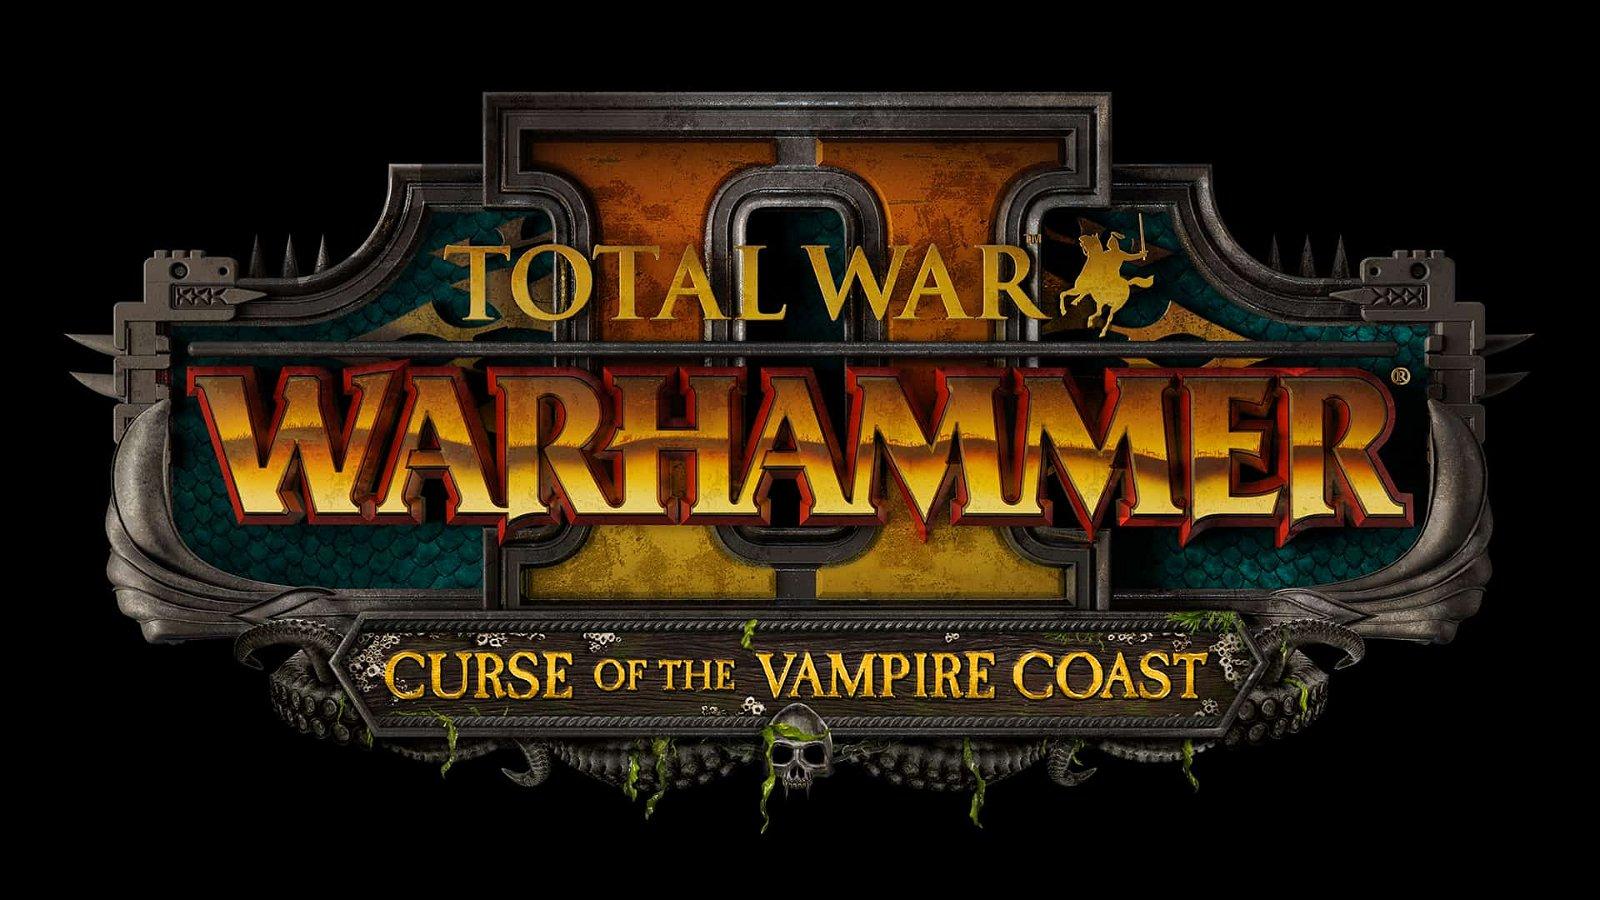 Total War: Warhammer II: Curse of the Vampire Coast 7